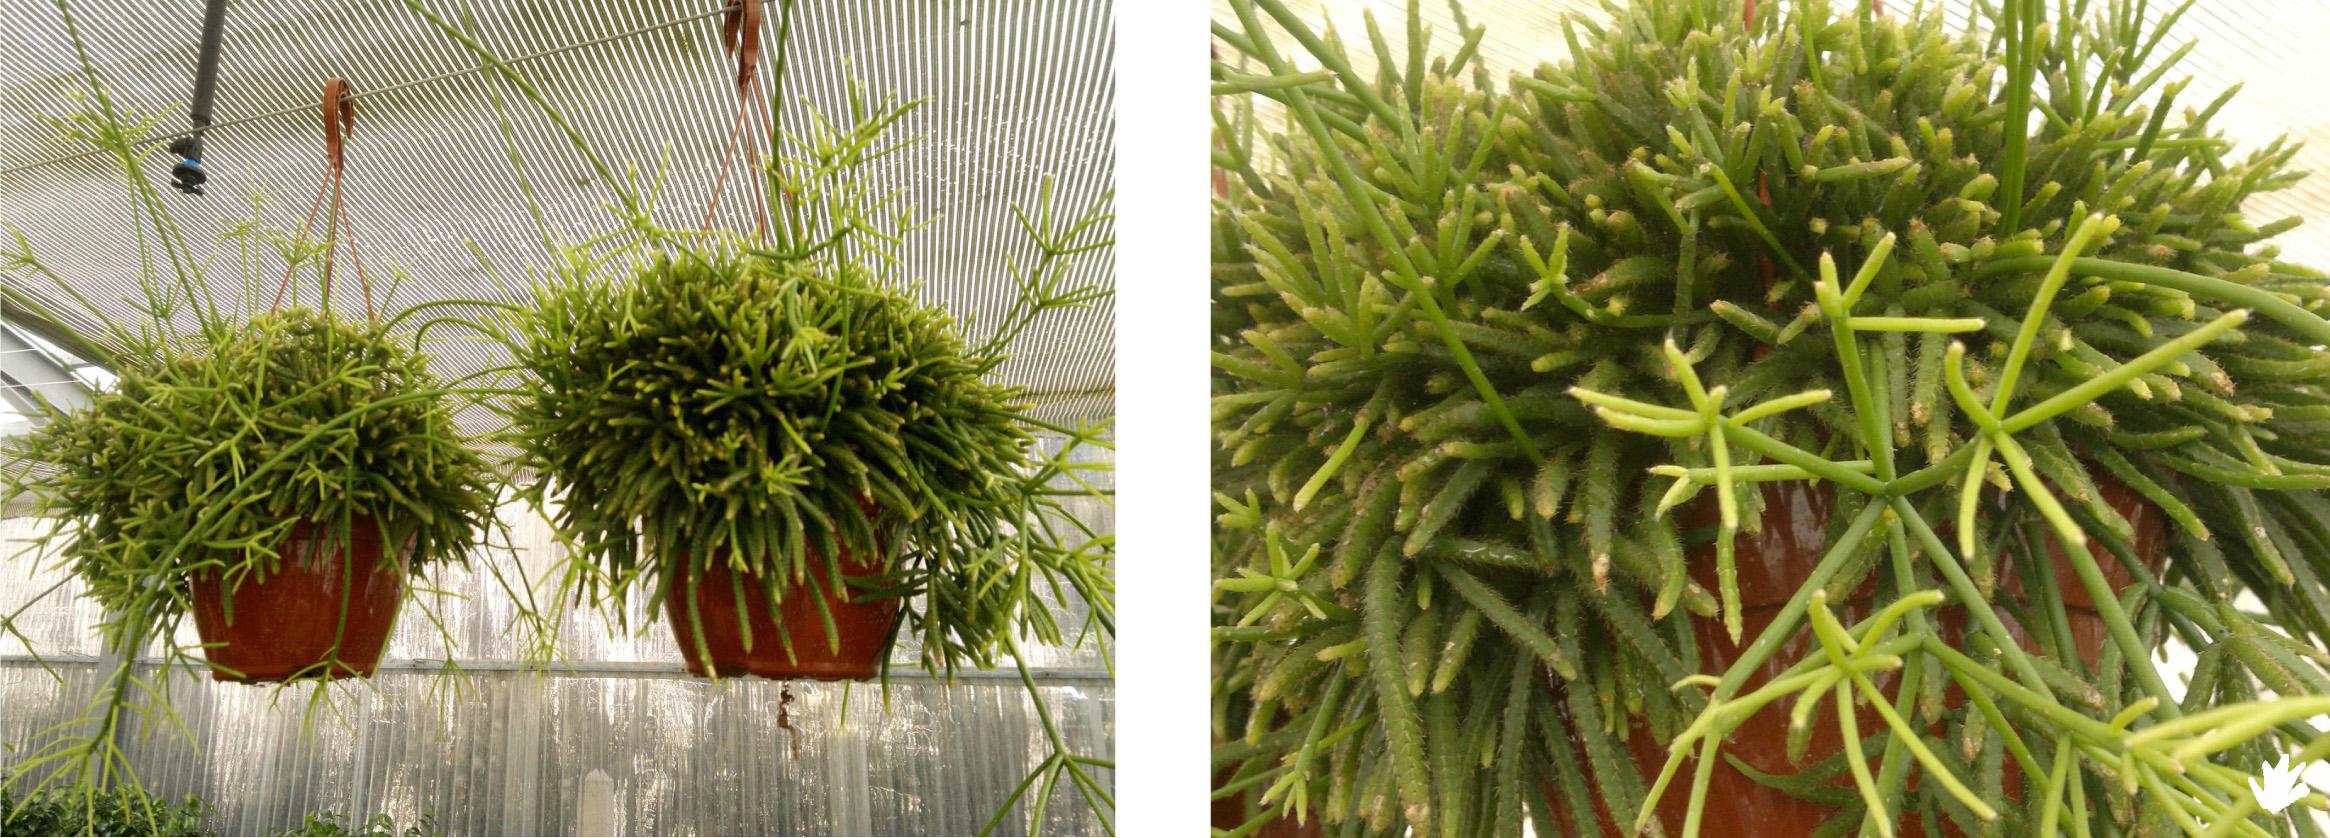 plantas ep fitas para los jardines verticales paivert